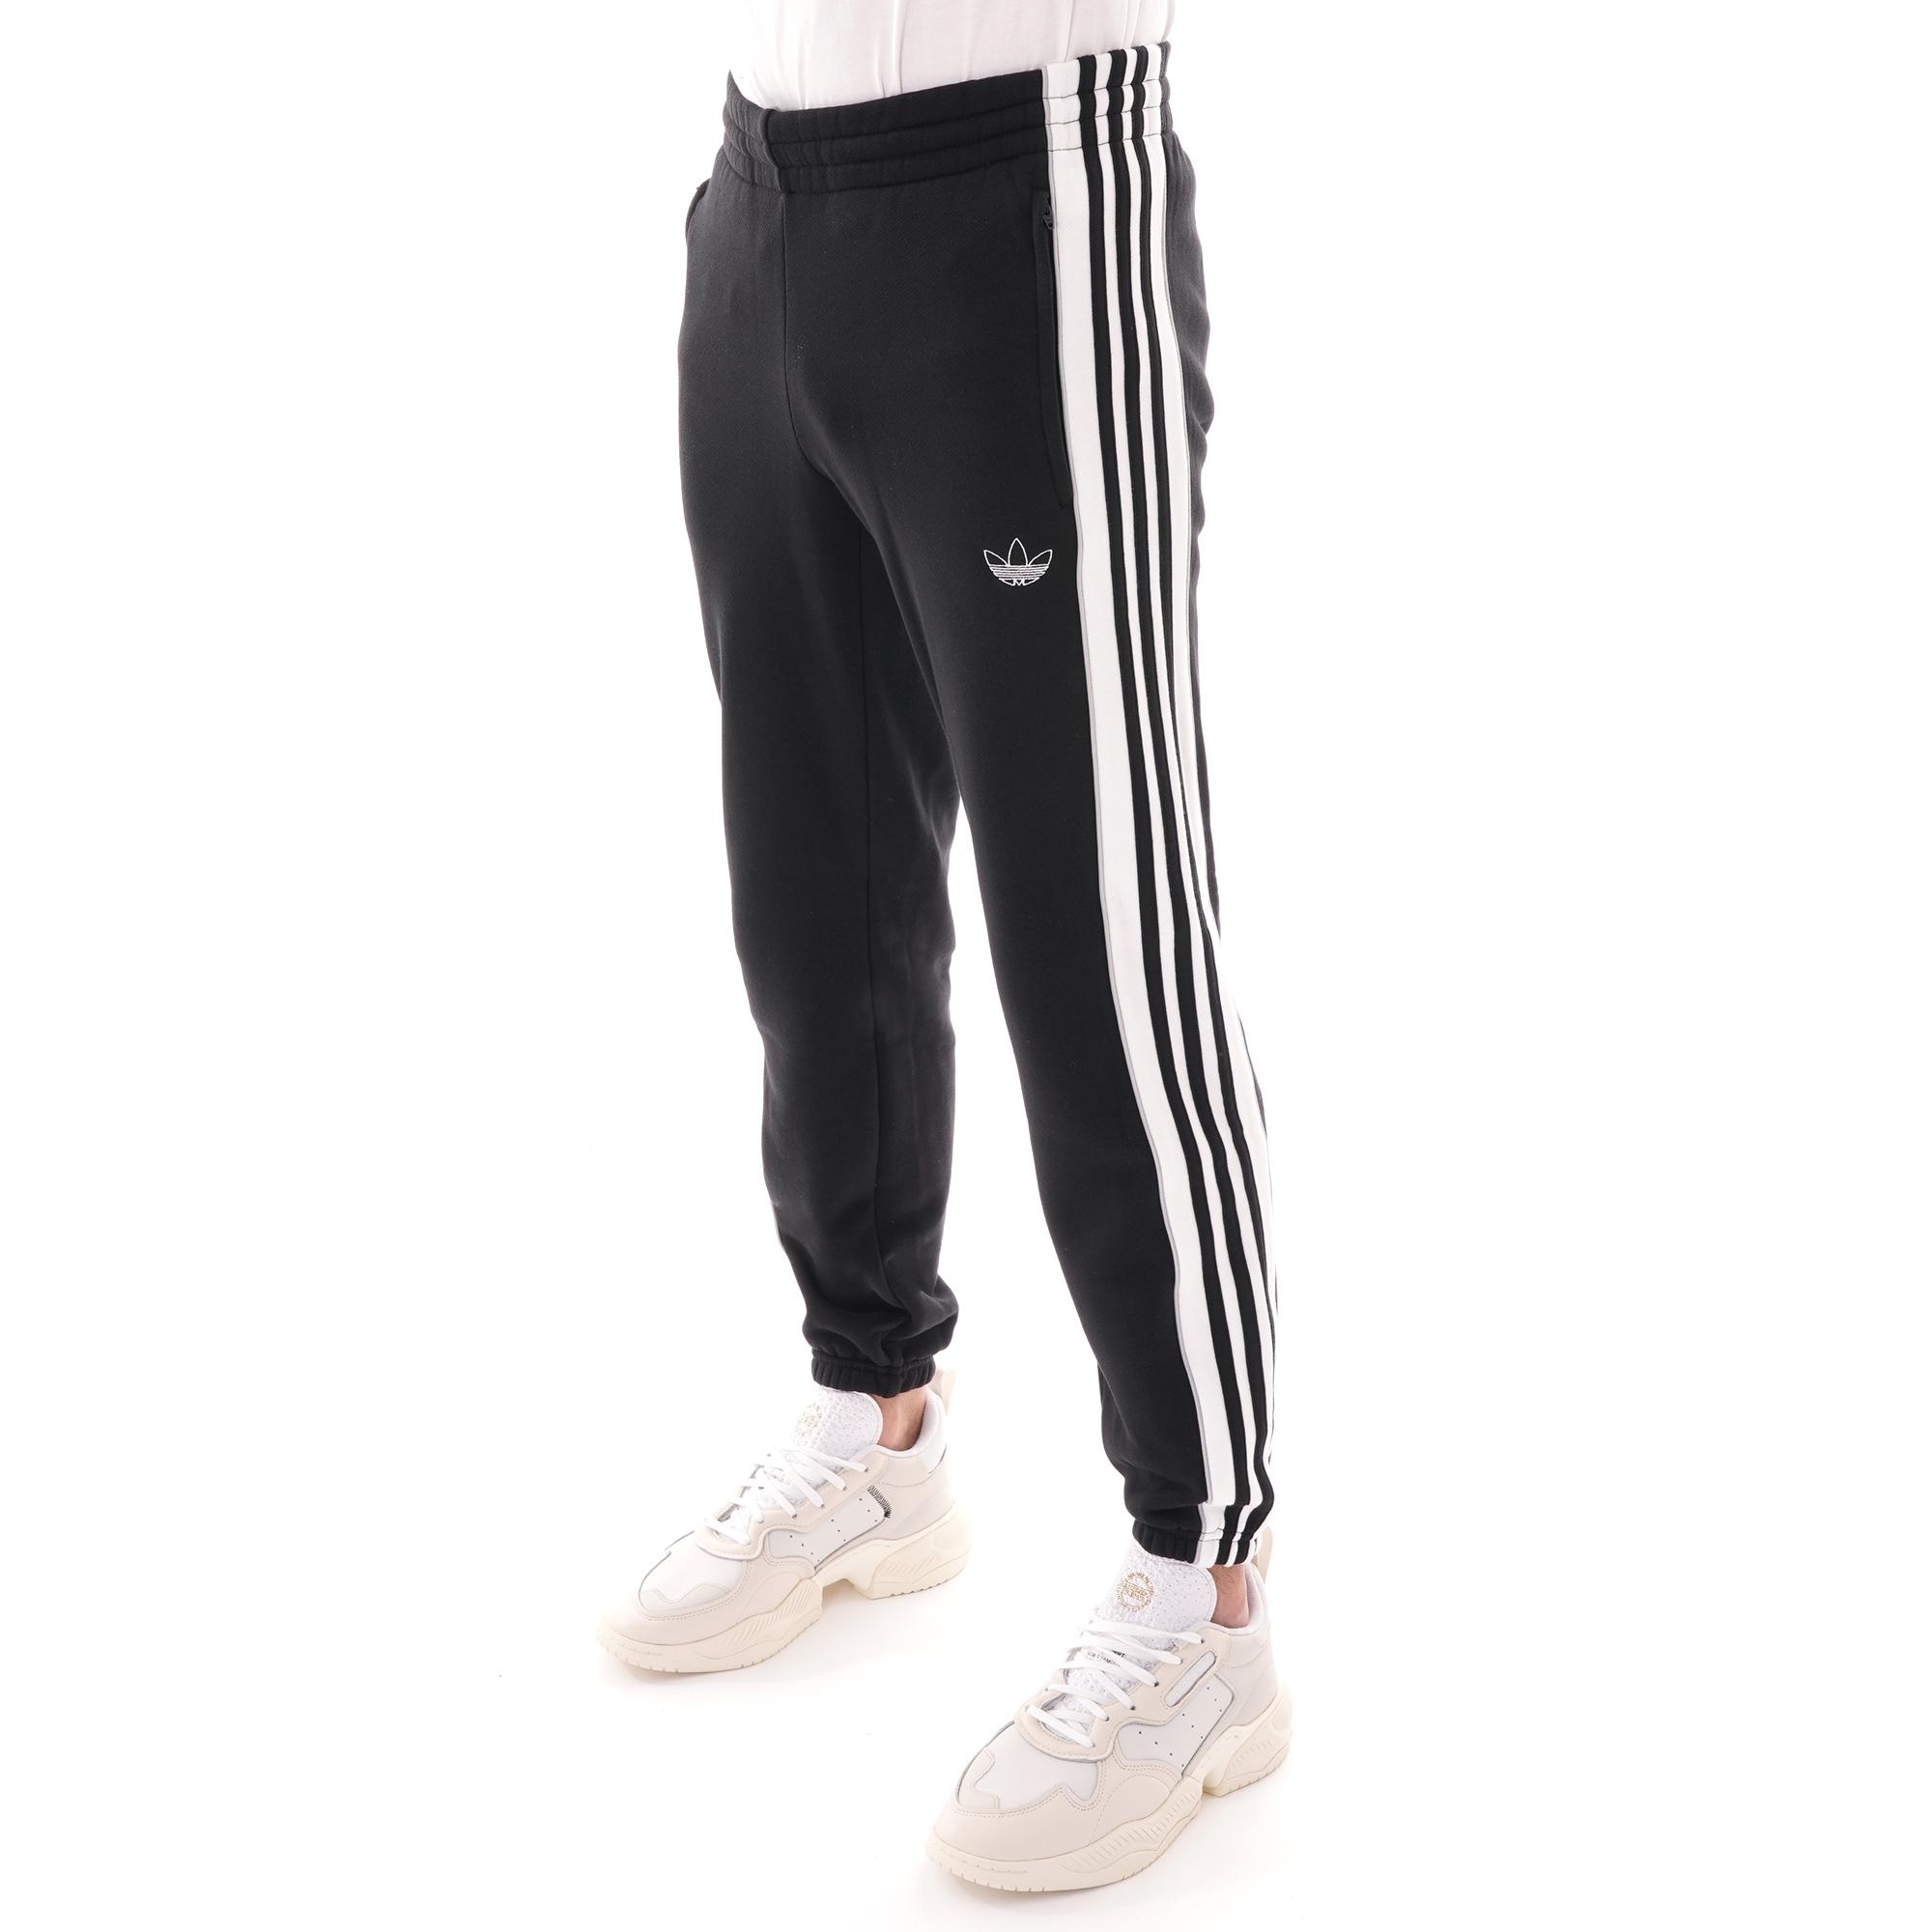 adidas pants stripes shoed